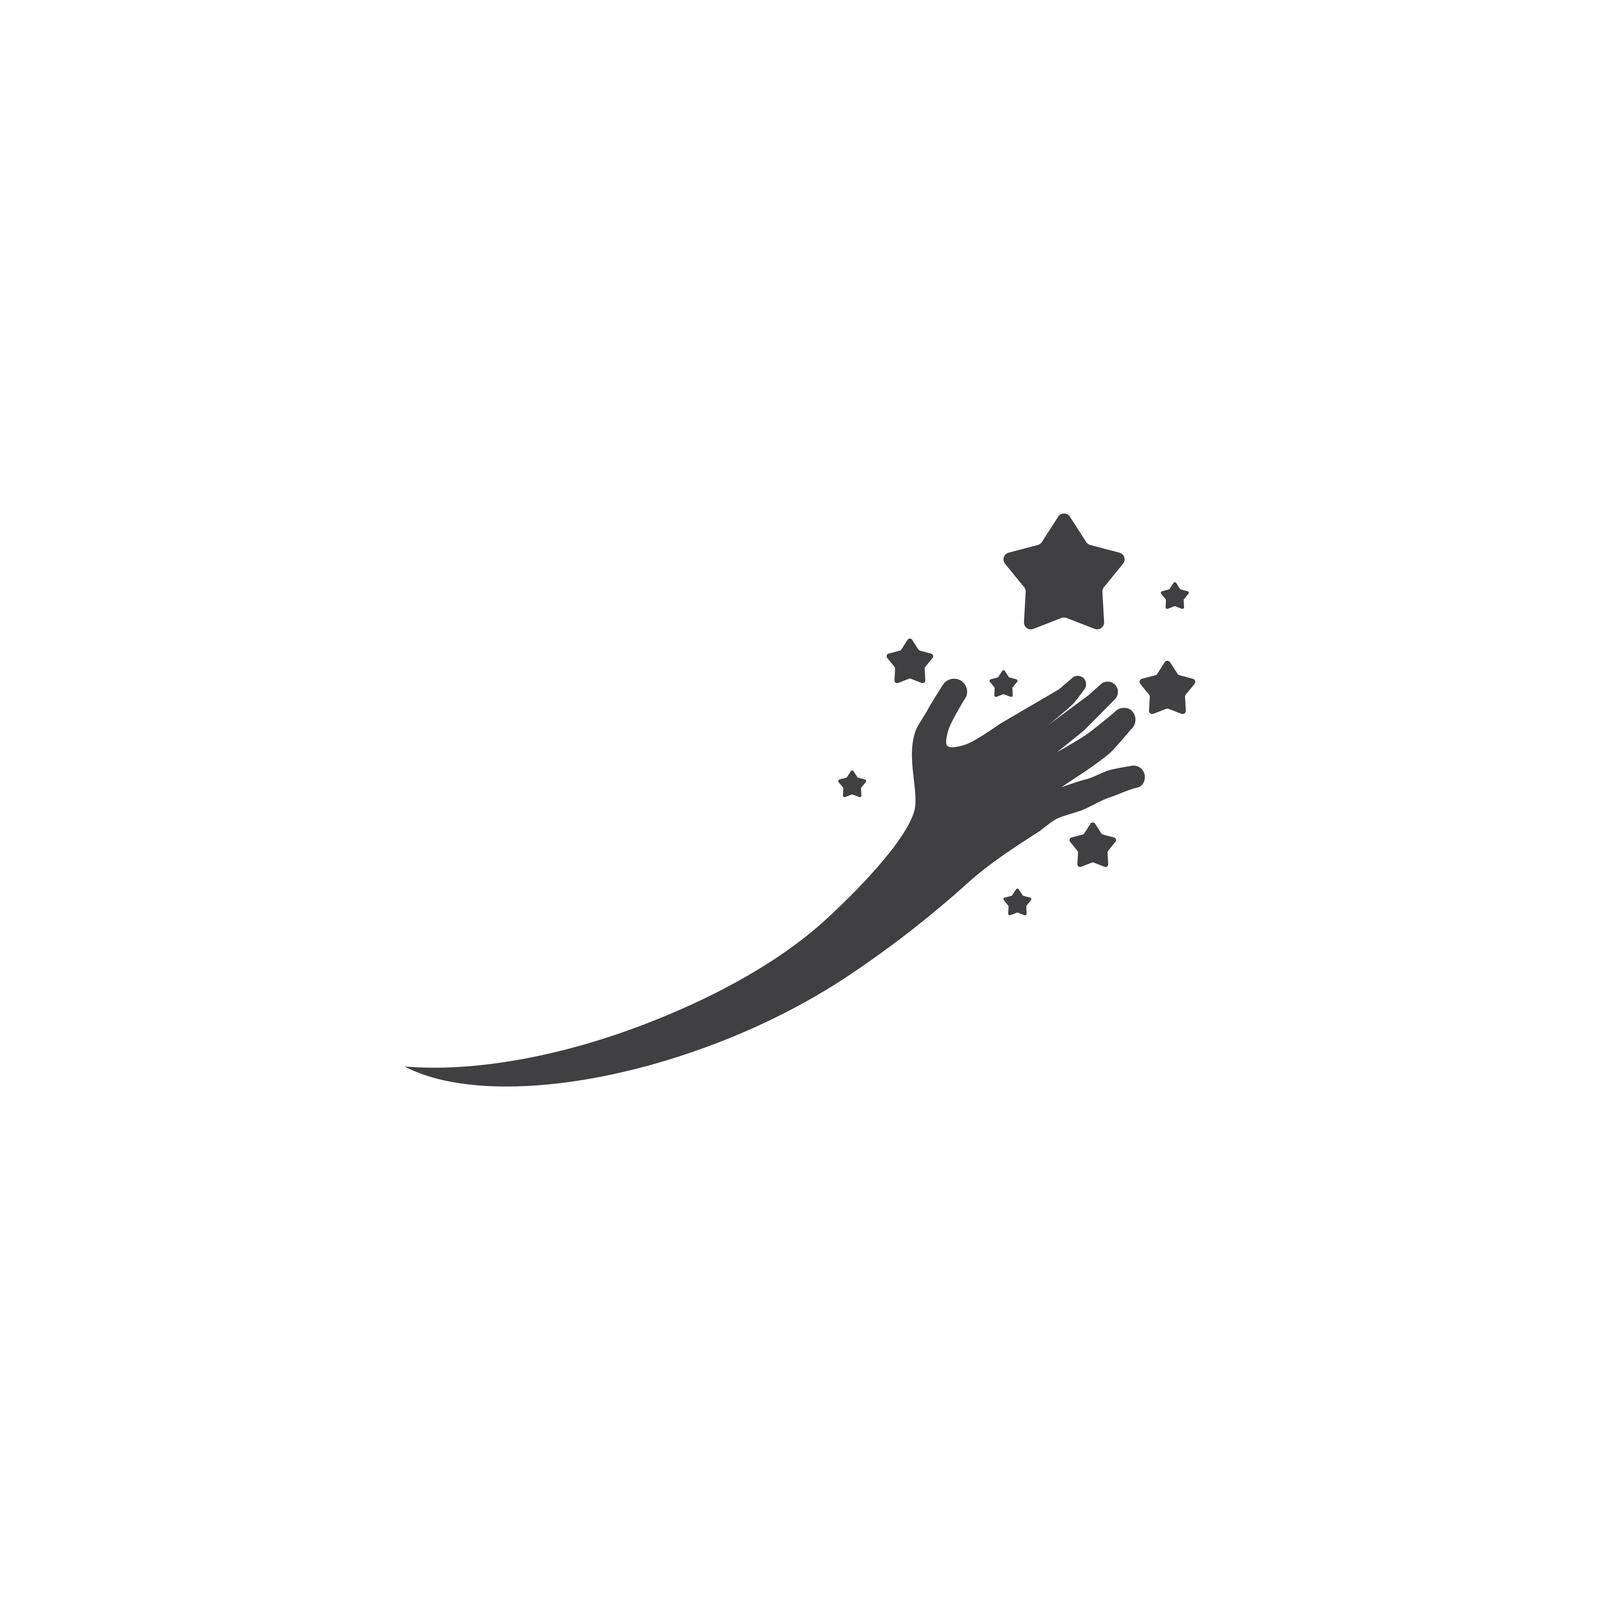 Dreams star logo vector design